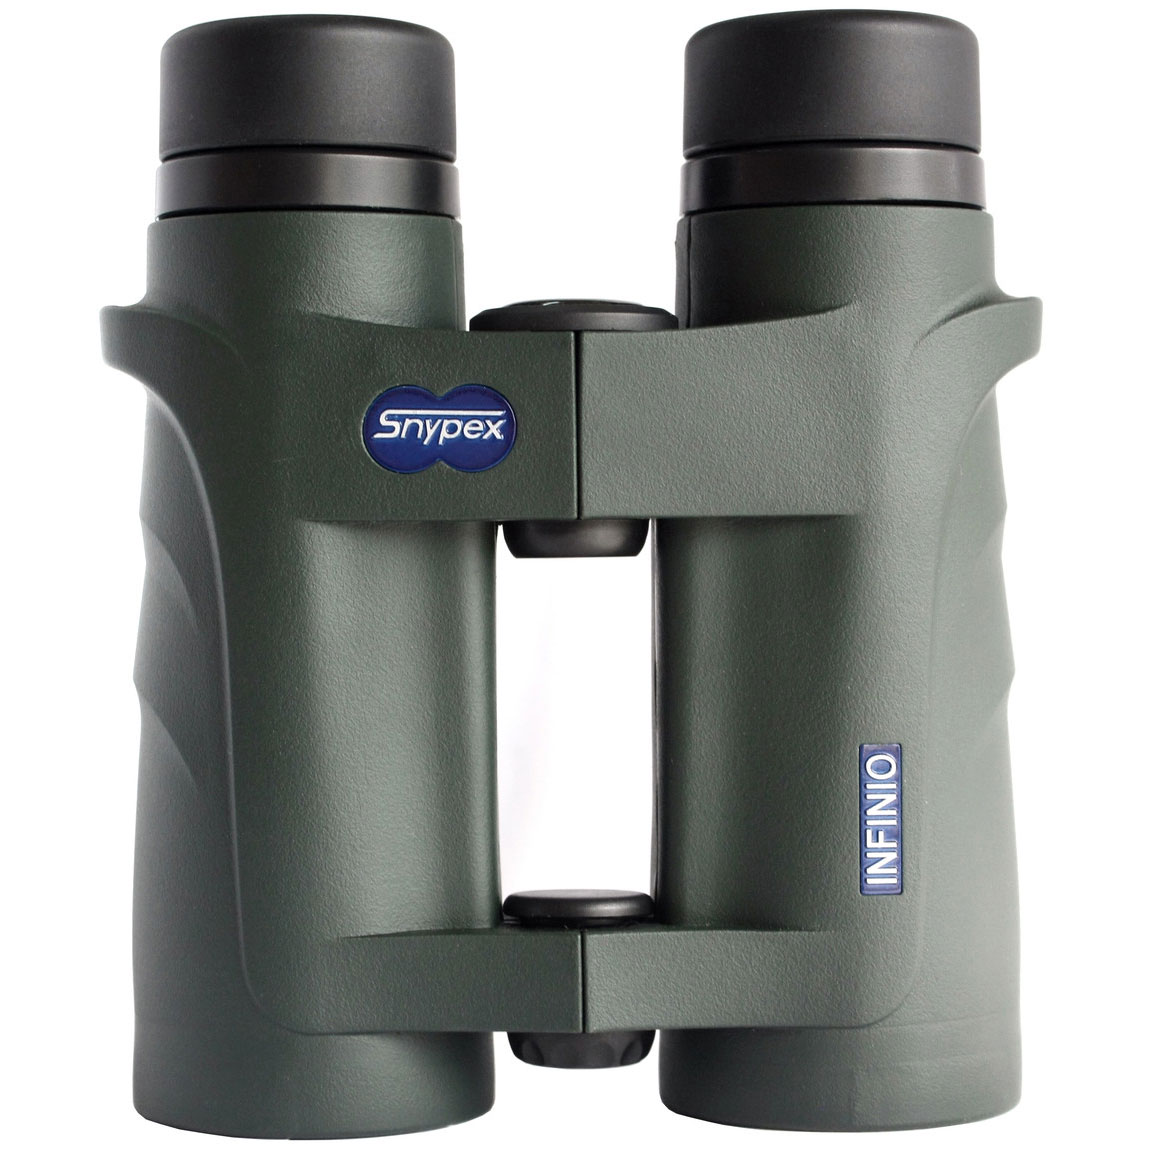 Snypex Infinio Focus Free 10x42 Binoculars with Case (Green)